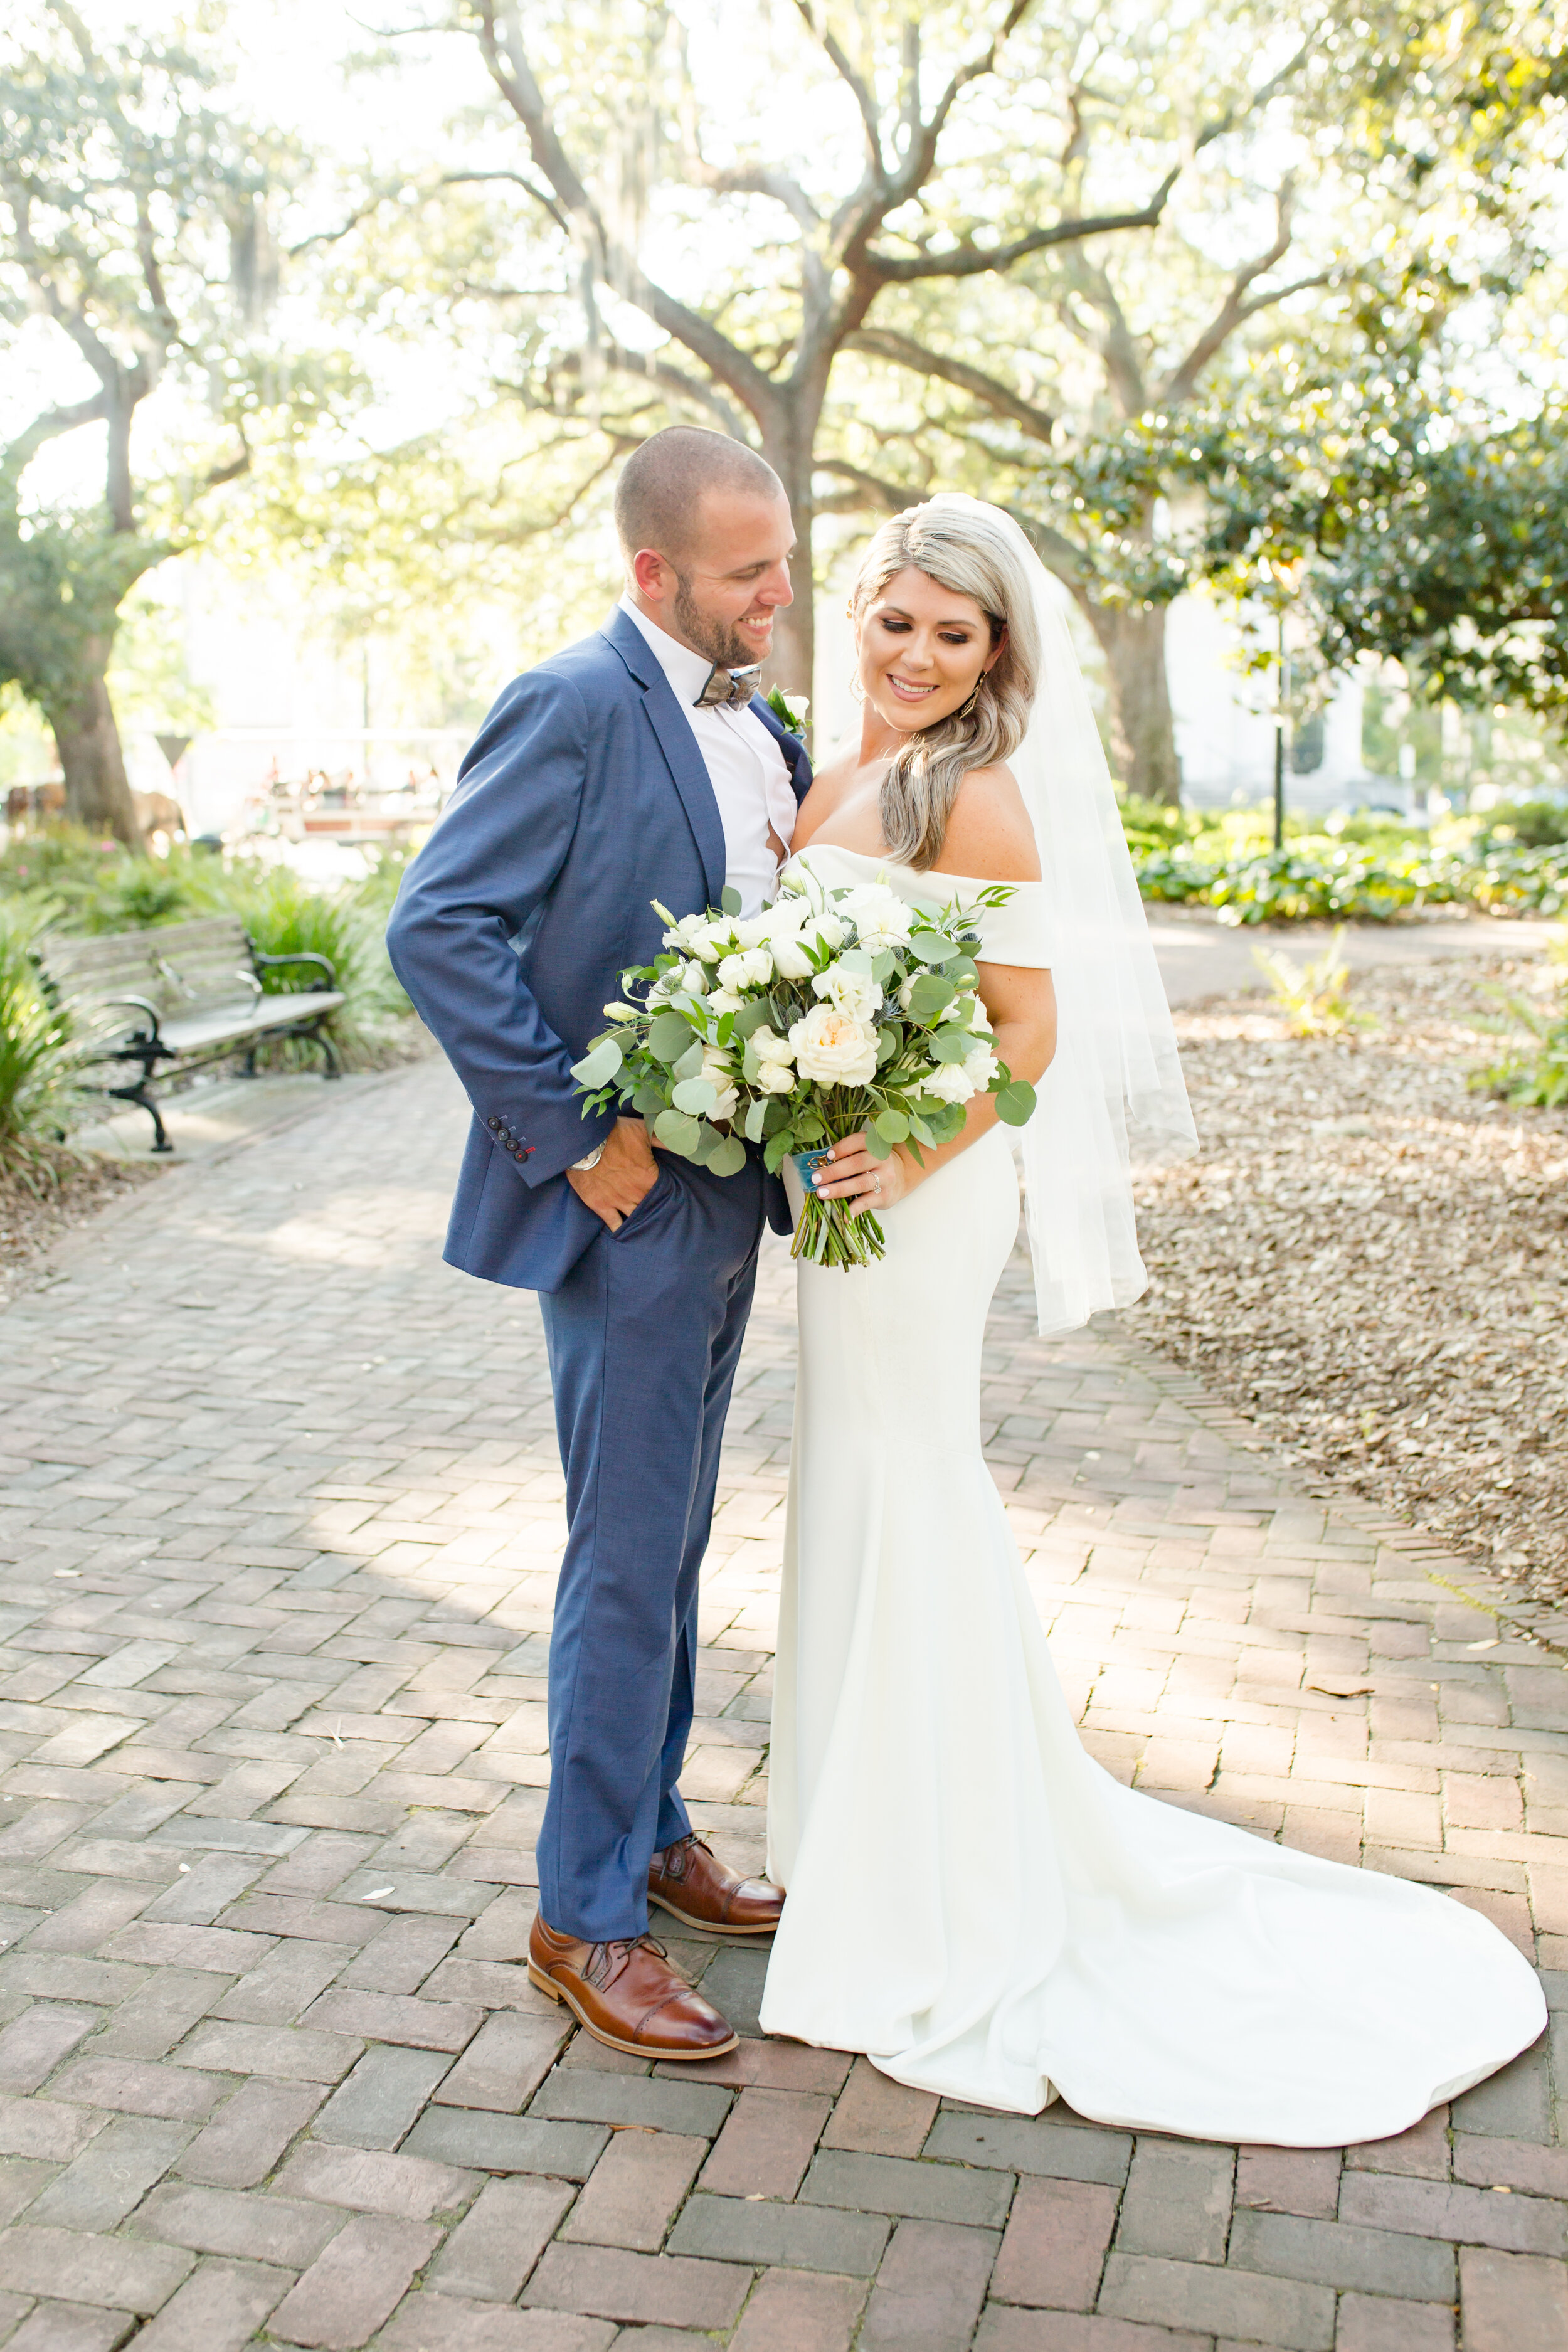 ivory-and-beau-bride-wedding-dresses-bridal-boutique-bridal-shop-savannah-wedding-shop-DGP_SohoSouthCafe_Swanagin-Mullis-454.JPG